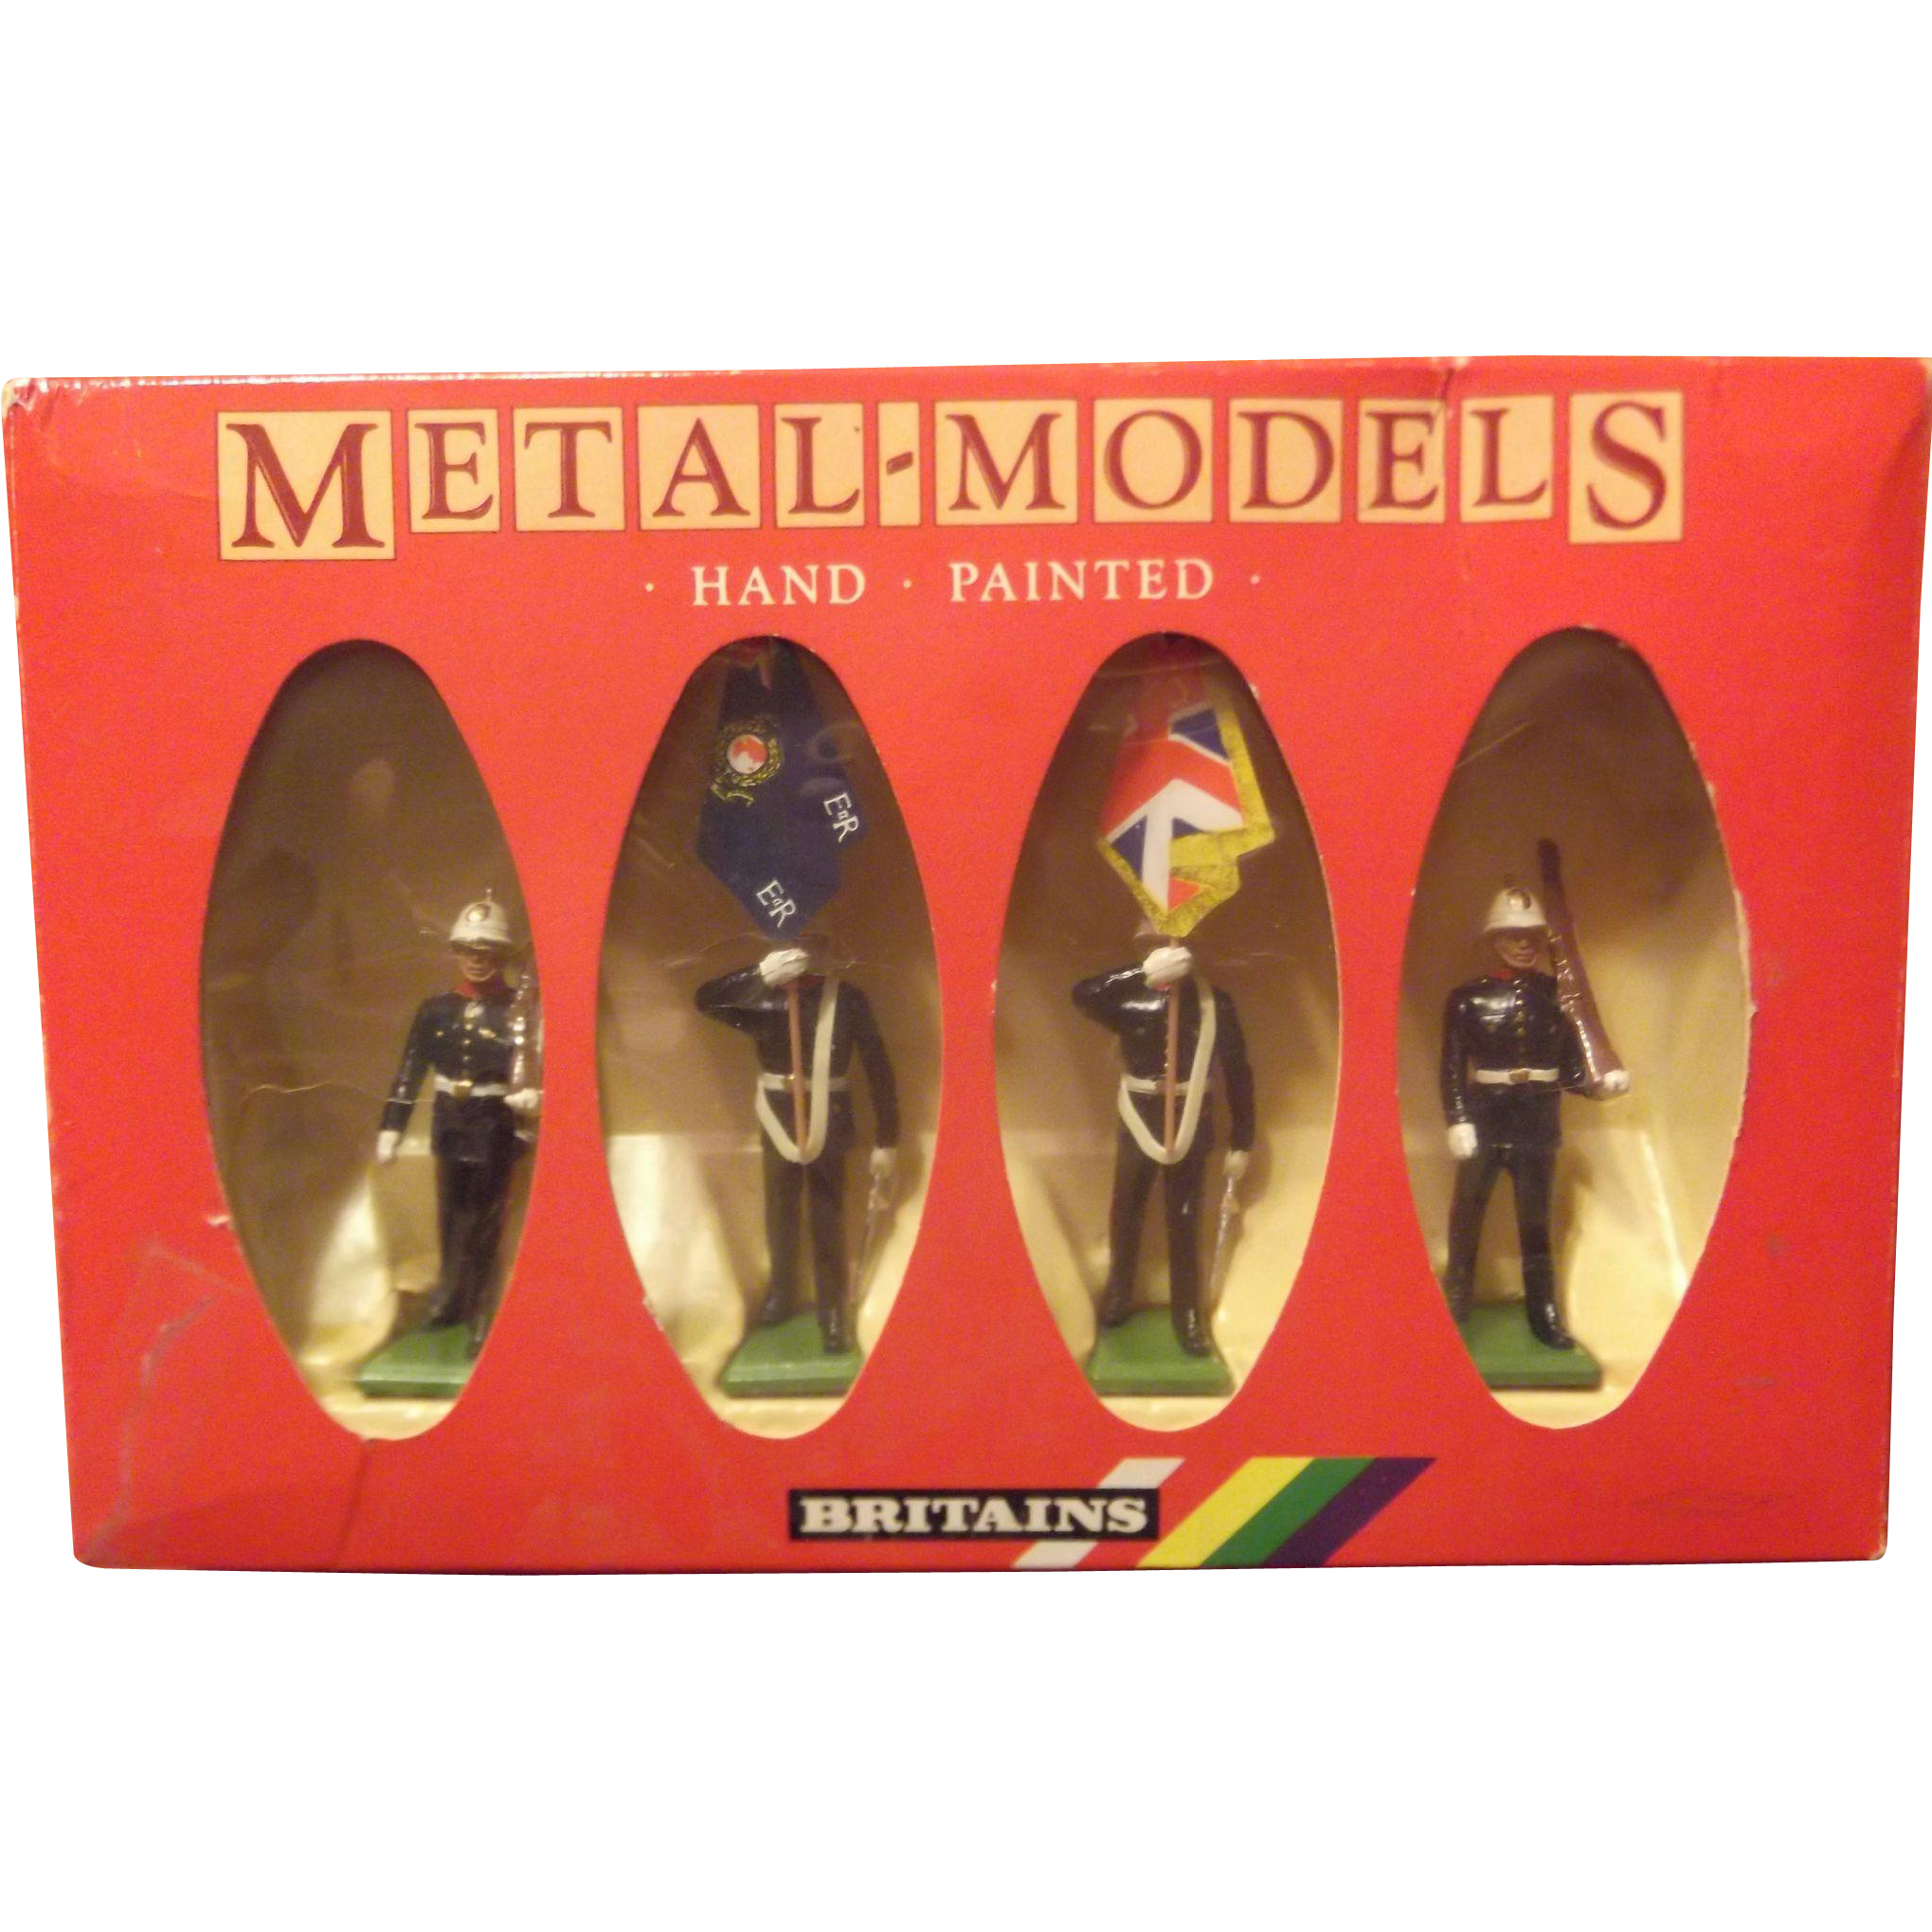 Britains Metal figures-Royal Marine figures. #7201